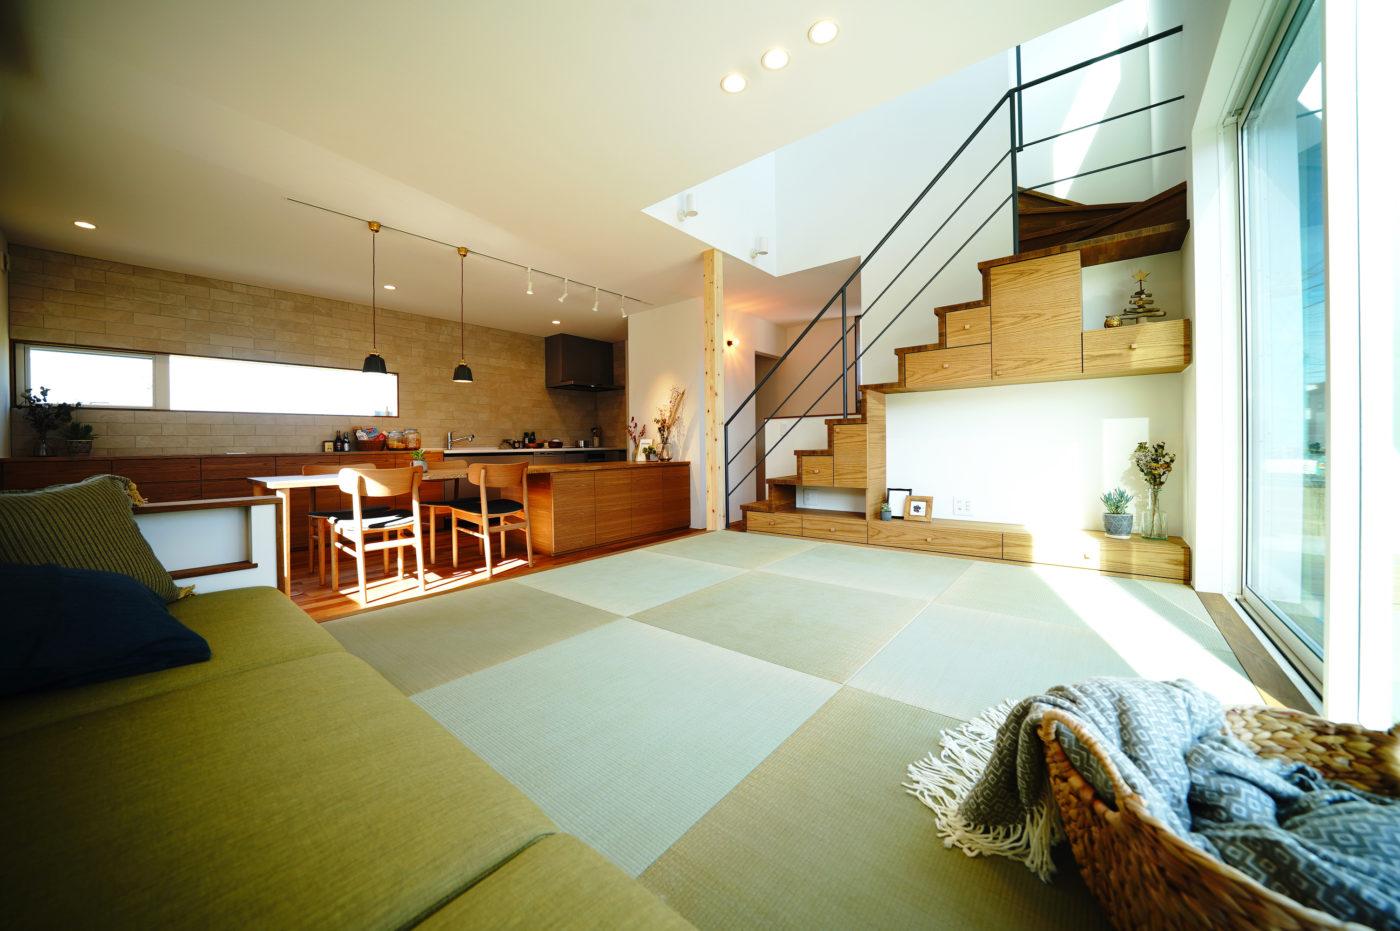 【11/28OPEN】【先行予約受付中】 三条市石上 ROMO モデルハウス見学会